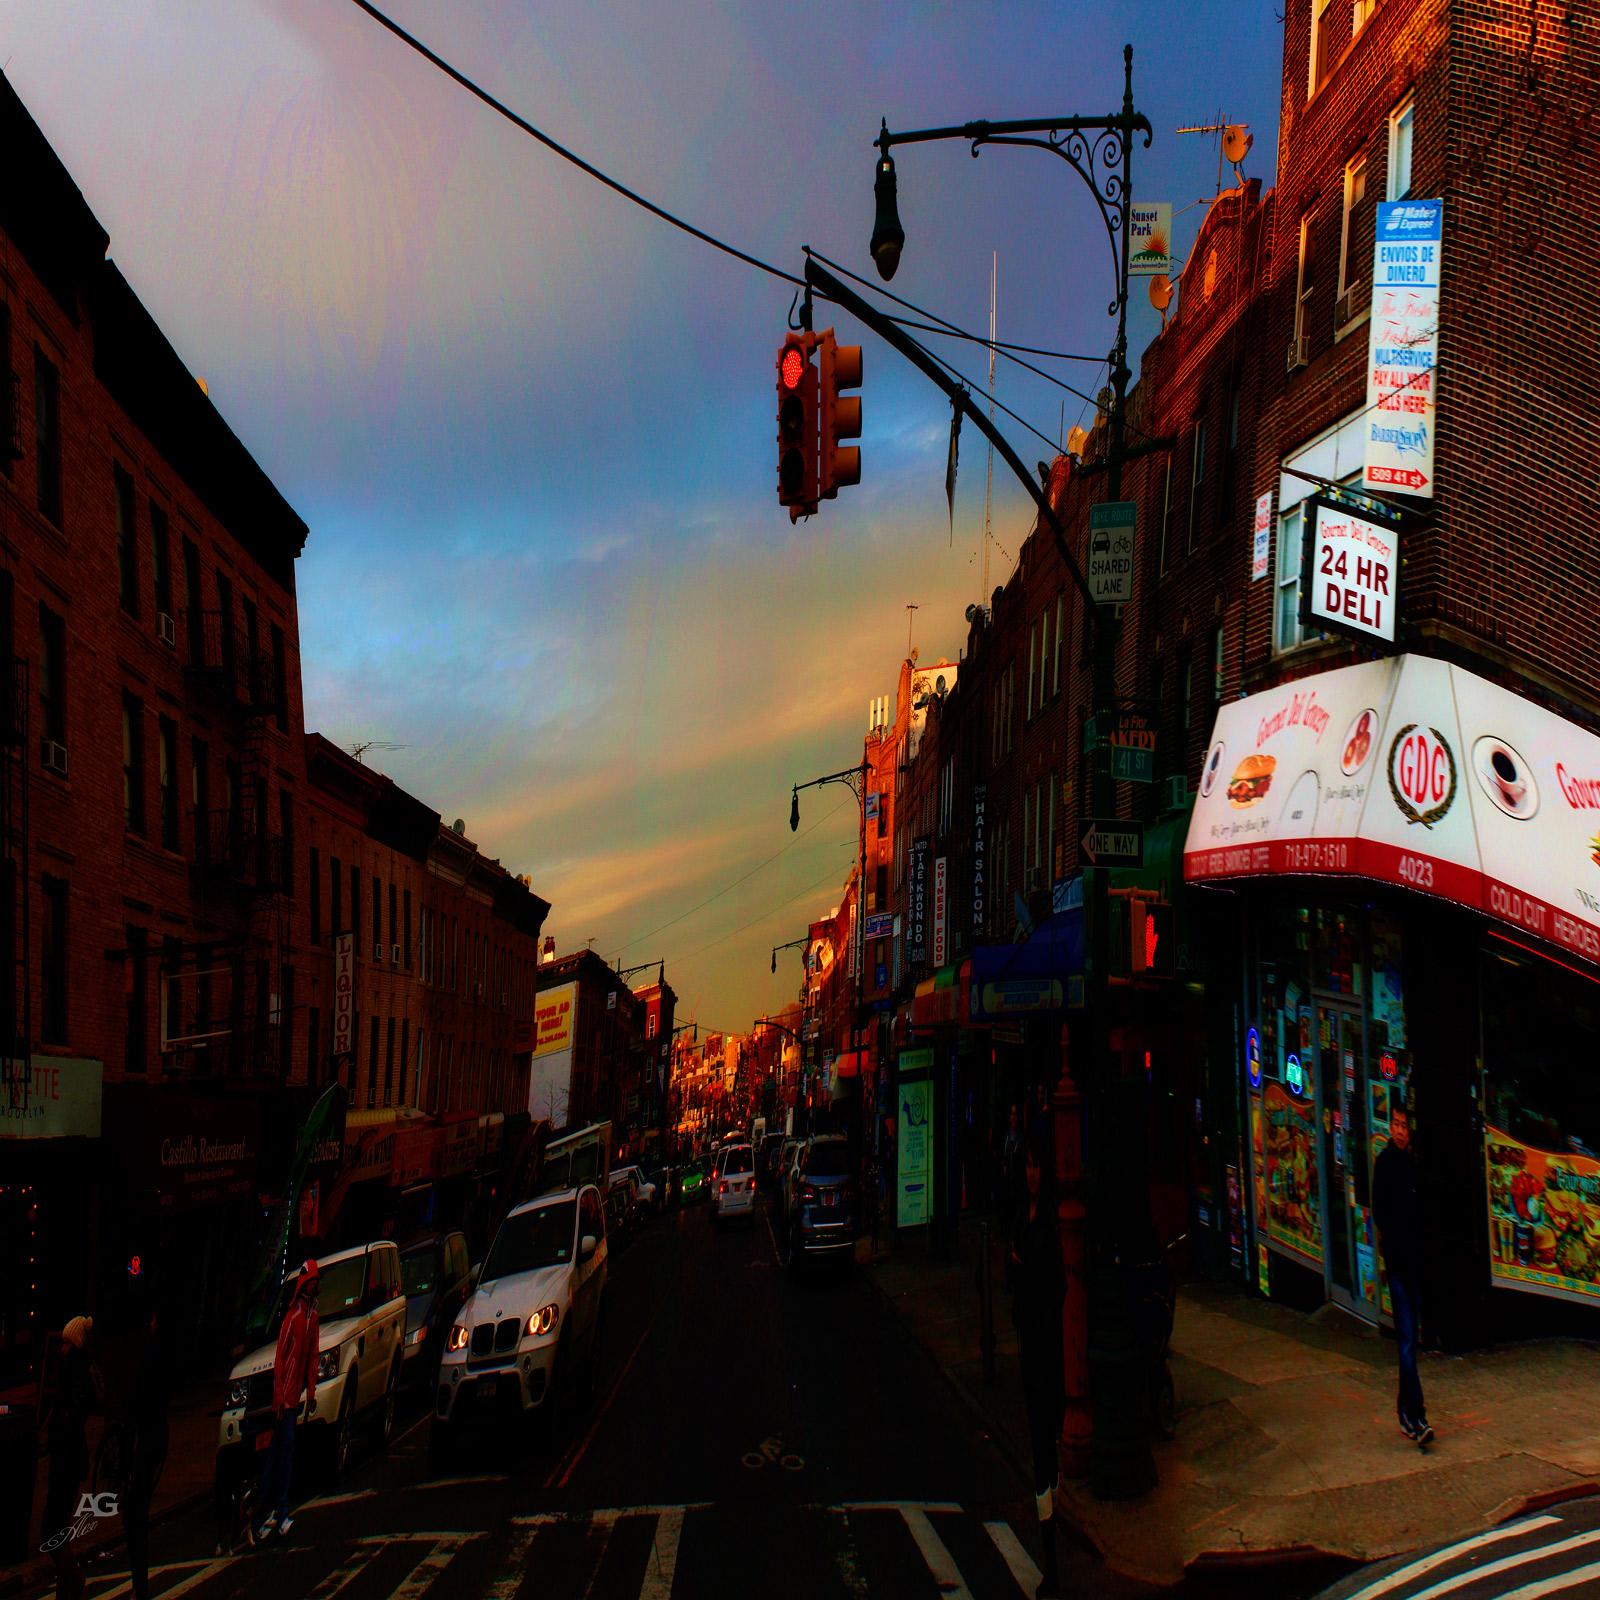 BrooklynStreetWithAViewOfDowntown_warped_1600